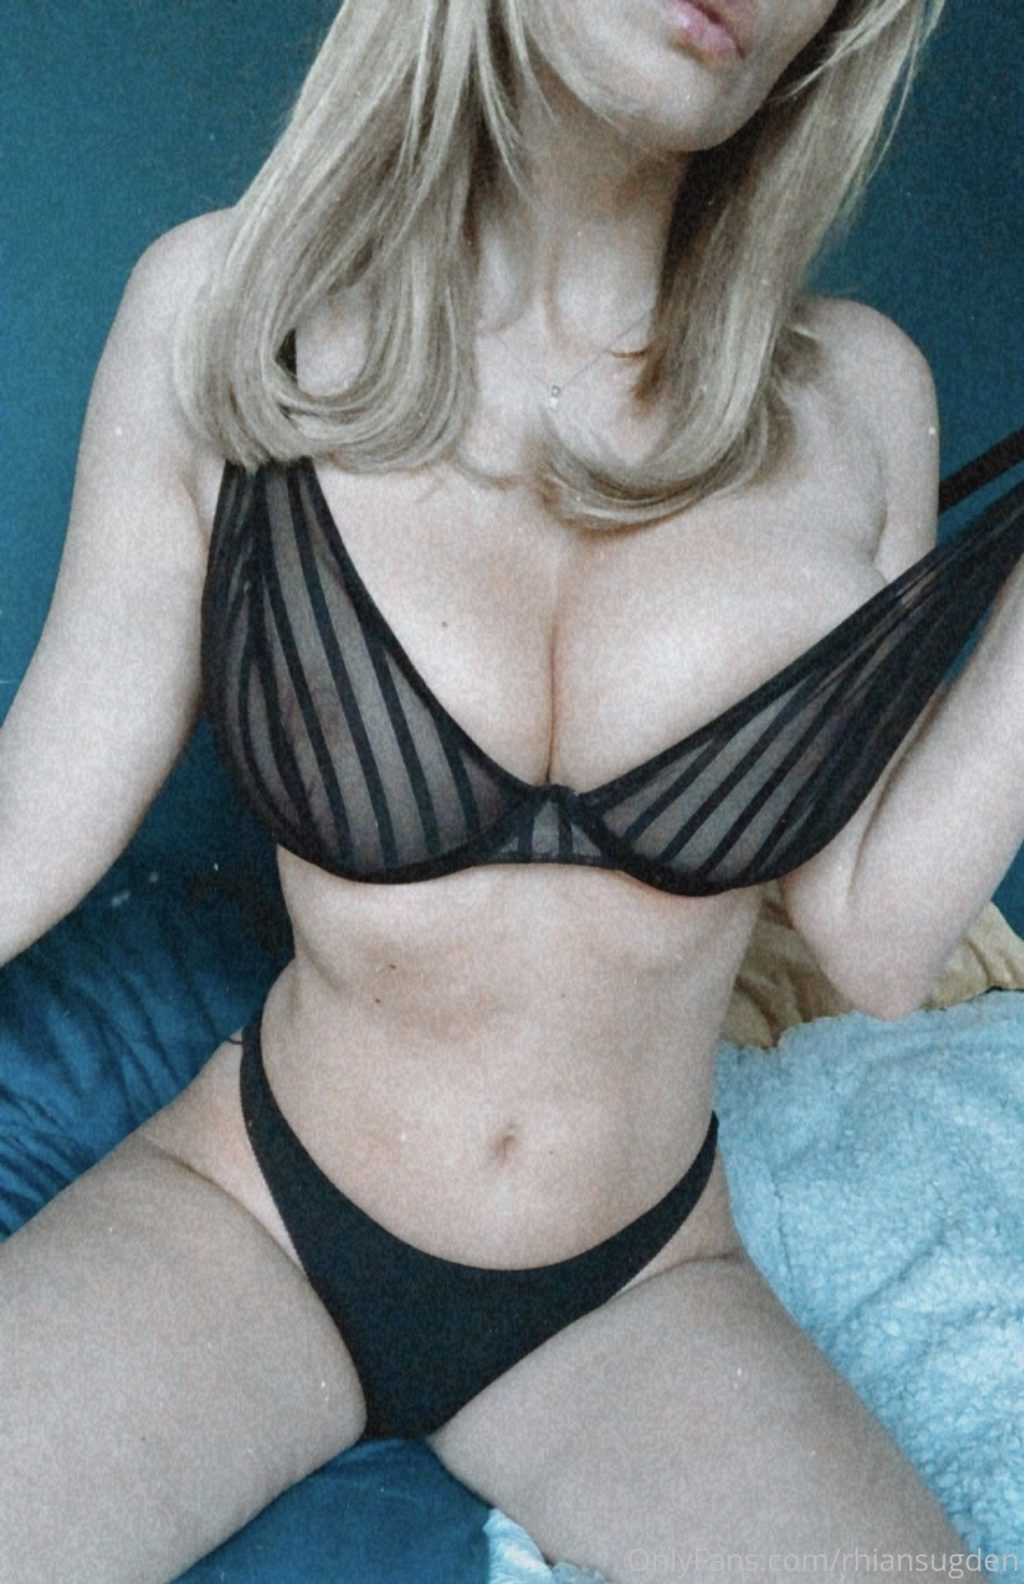 Rhian Sugden Nude & Sexy (6 Leaked Photos)